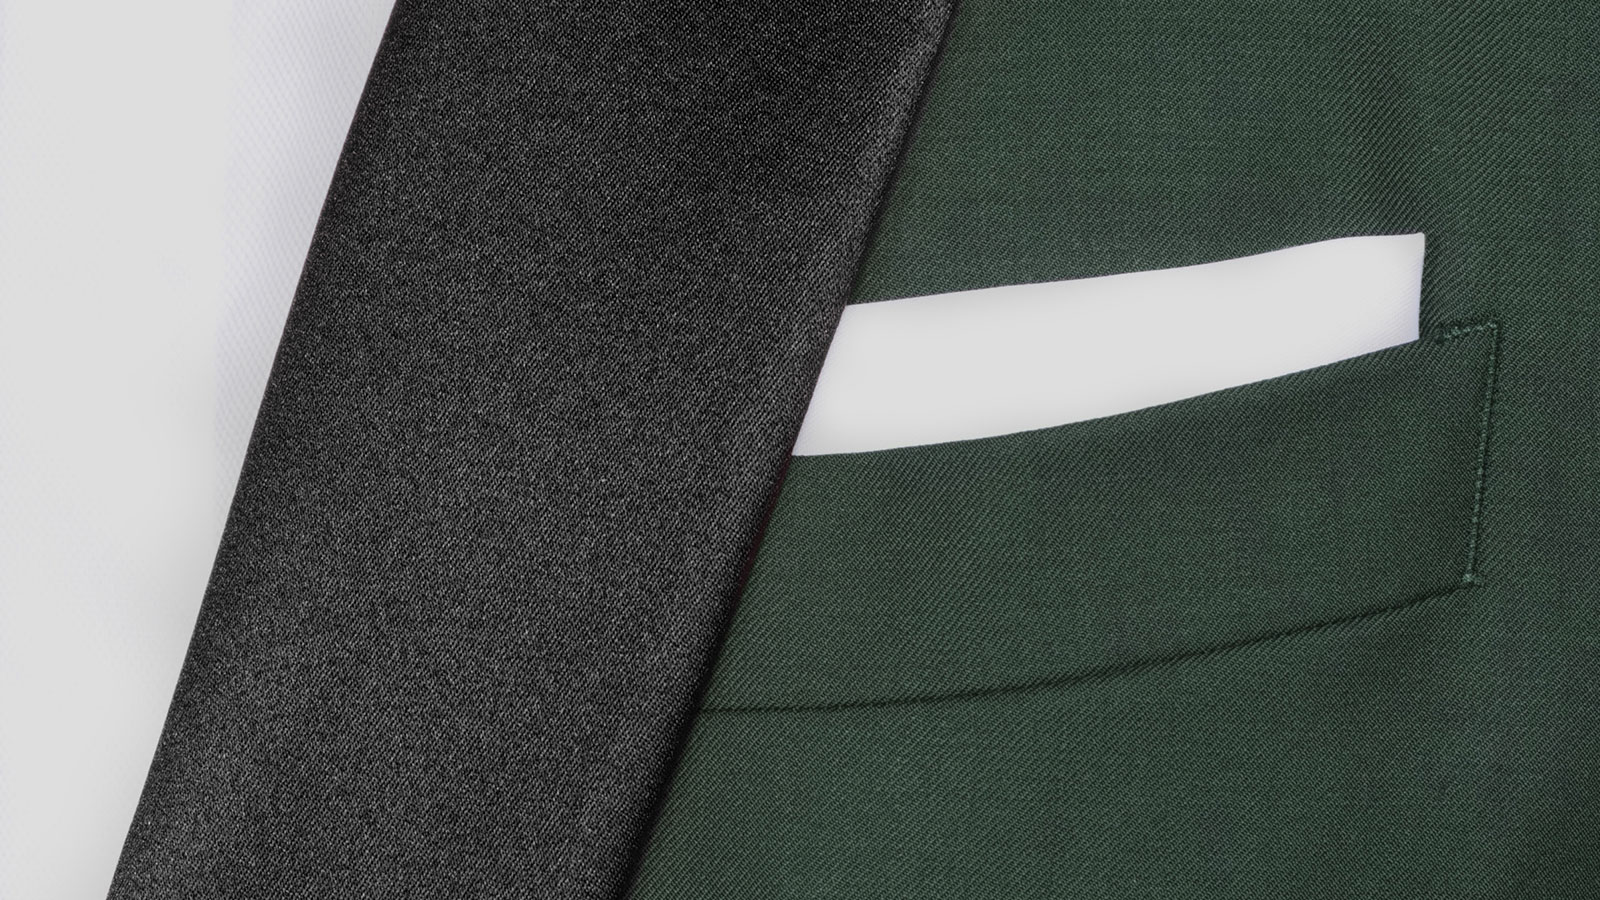 Vendetta Premium Solid Dark Green Tuxedo - slider image 1